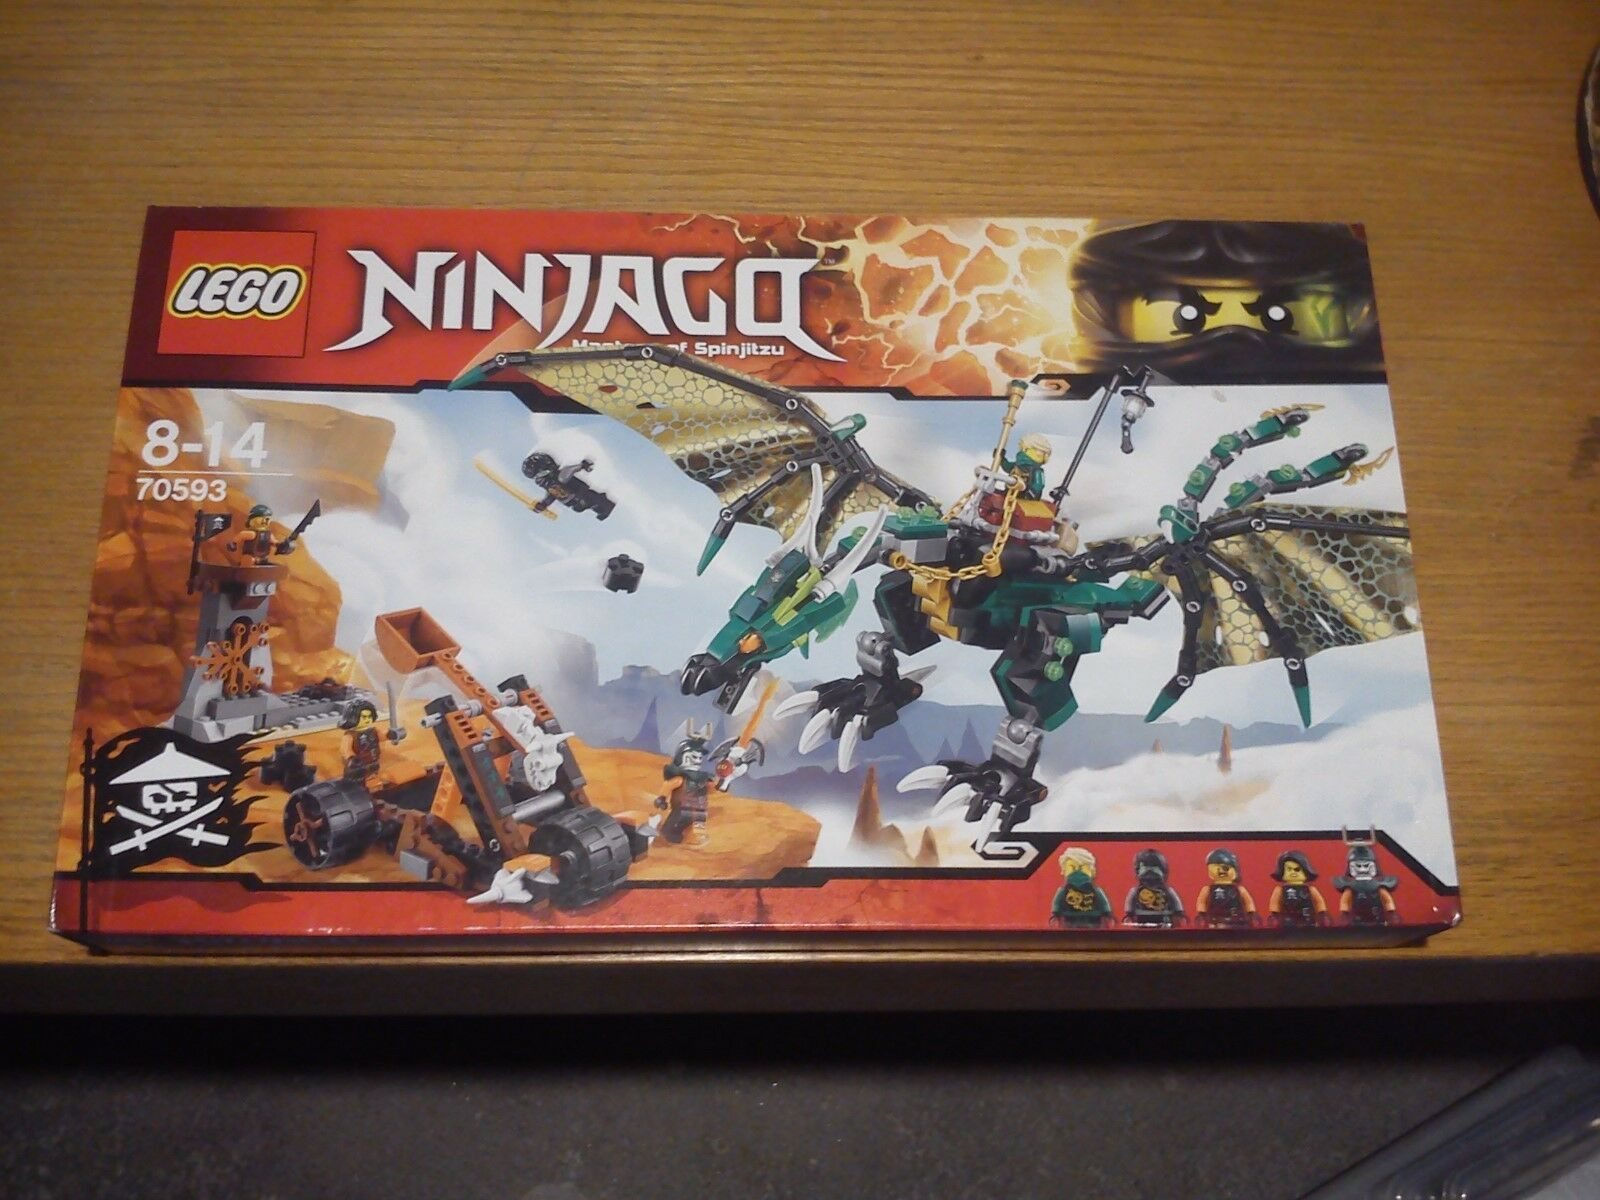 Lego Ninjago 70593 (Skybound) Le dragon émeraude de Lloyd (New & Sealed)